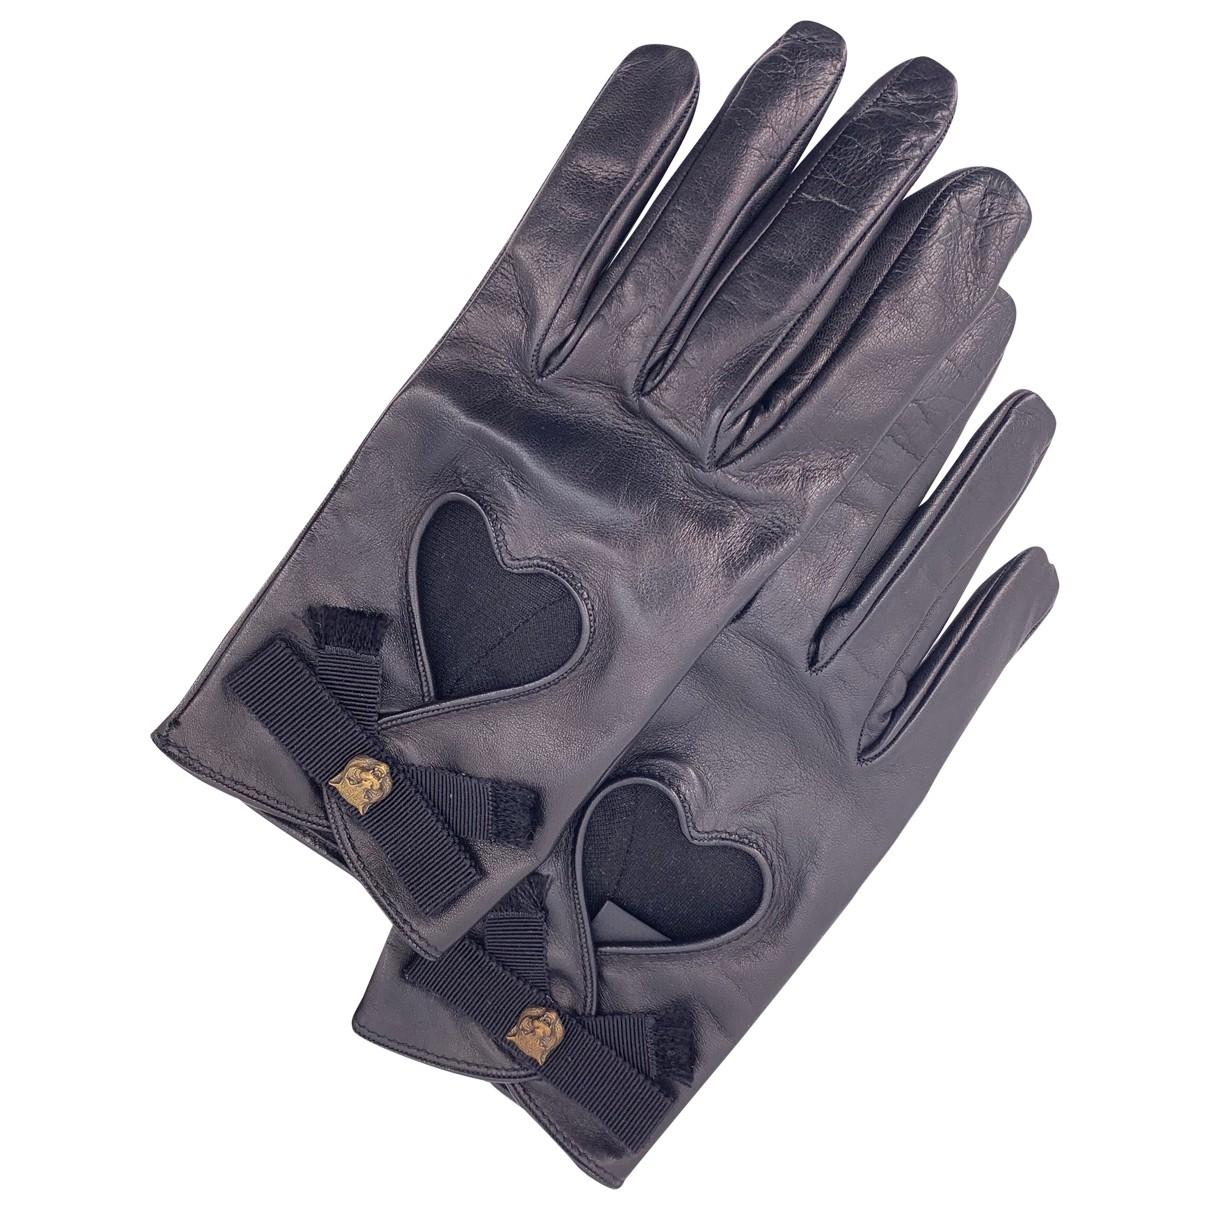 Gucci \N Black Leather Gloves for Women L International